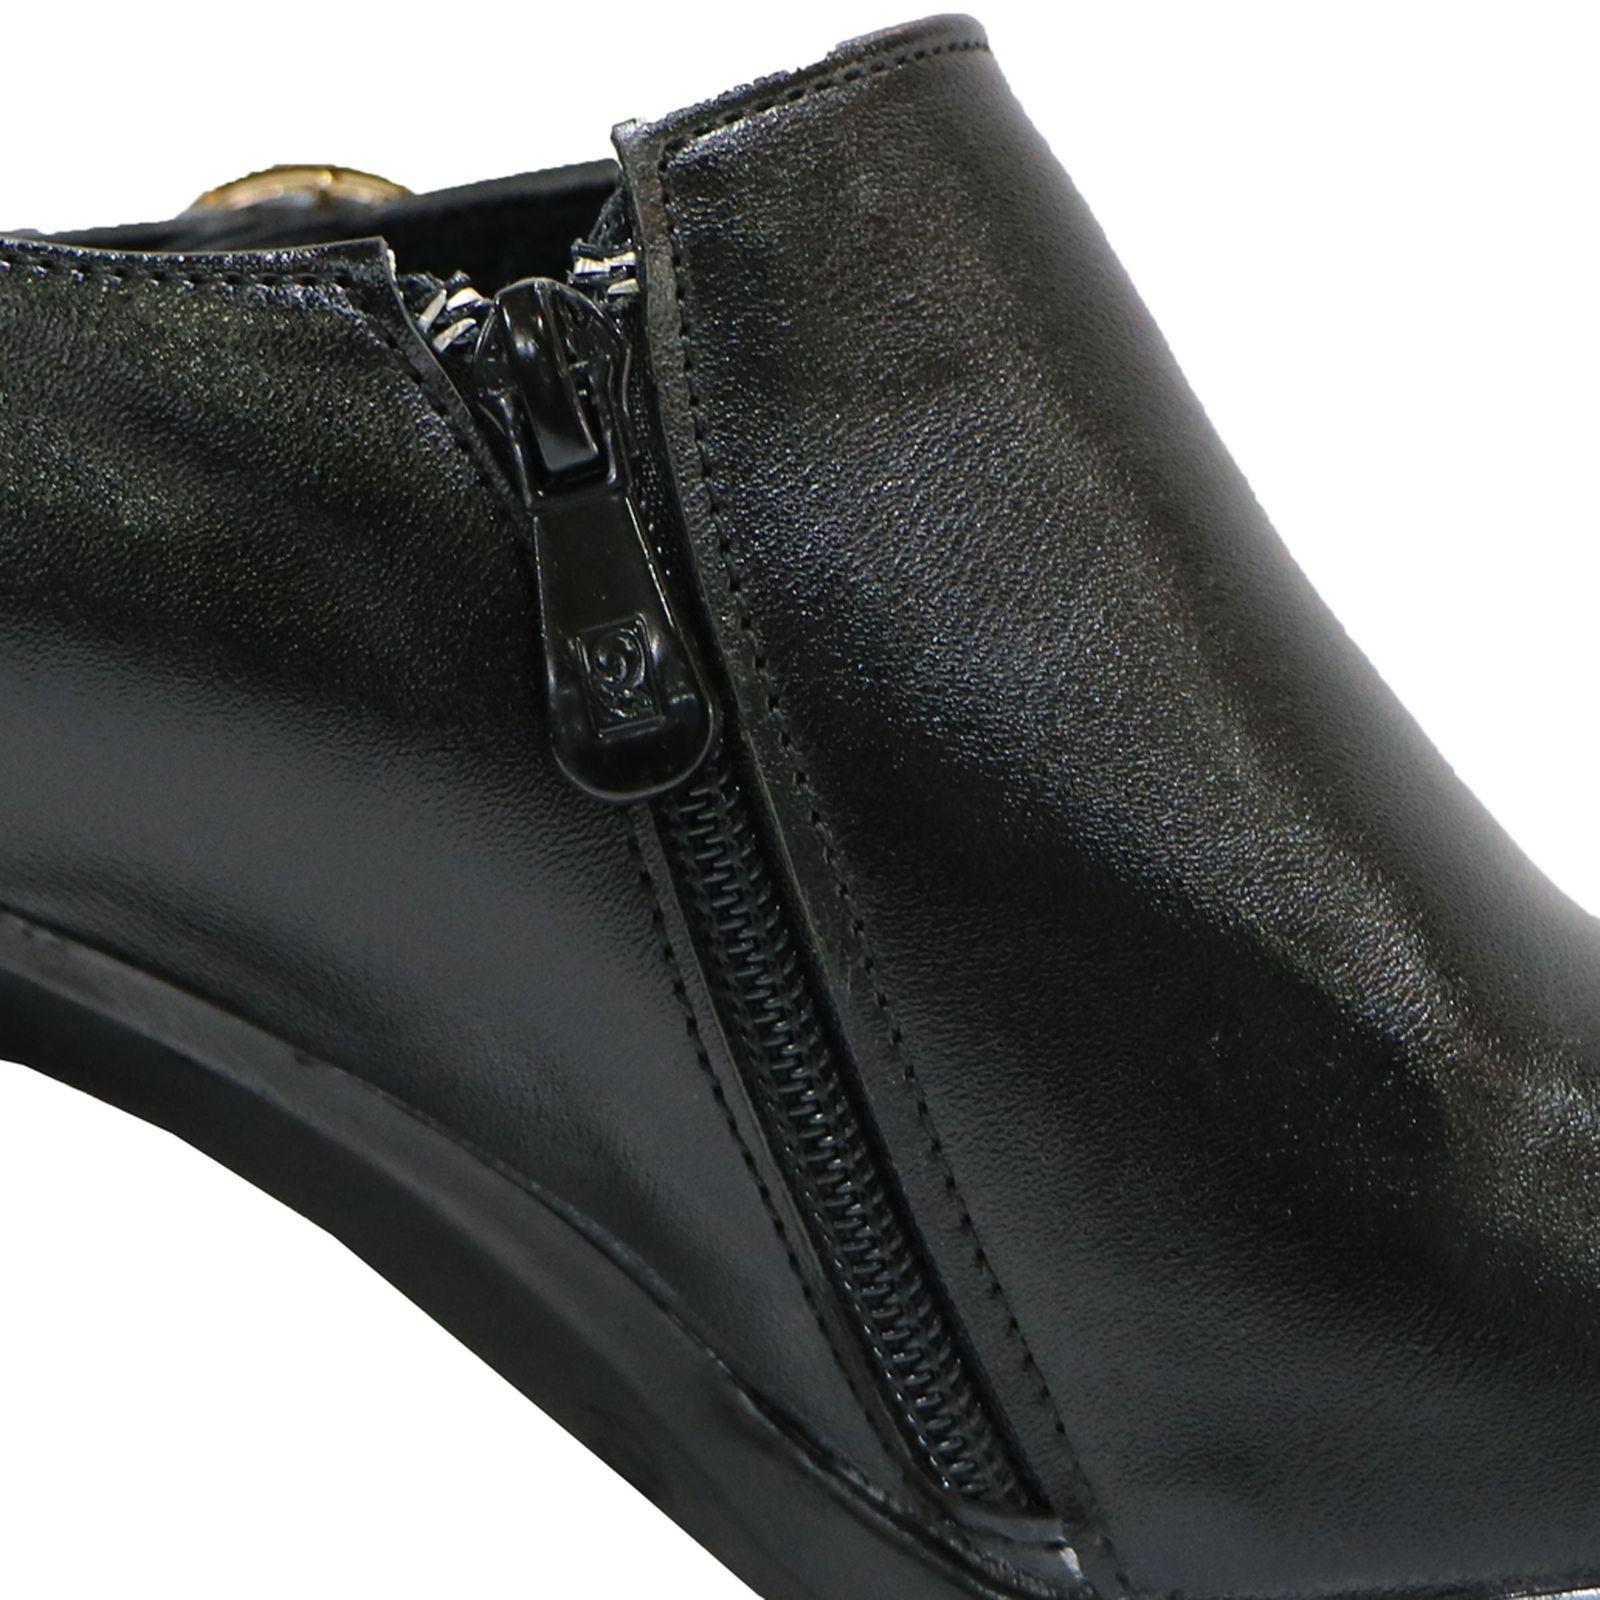 کفش زنانه کد 98223 -  - 7